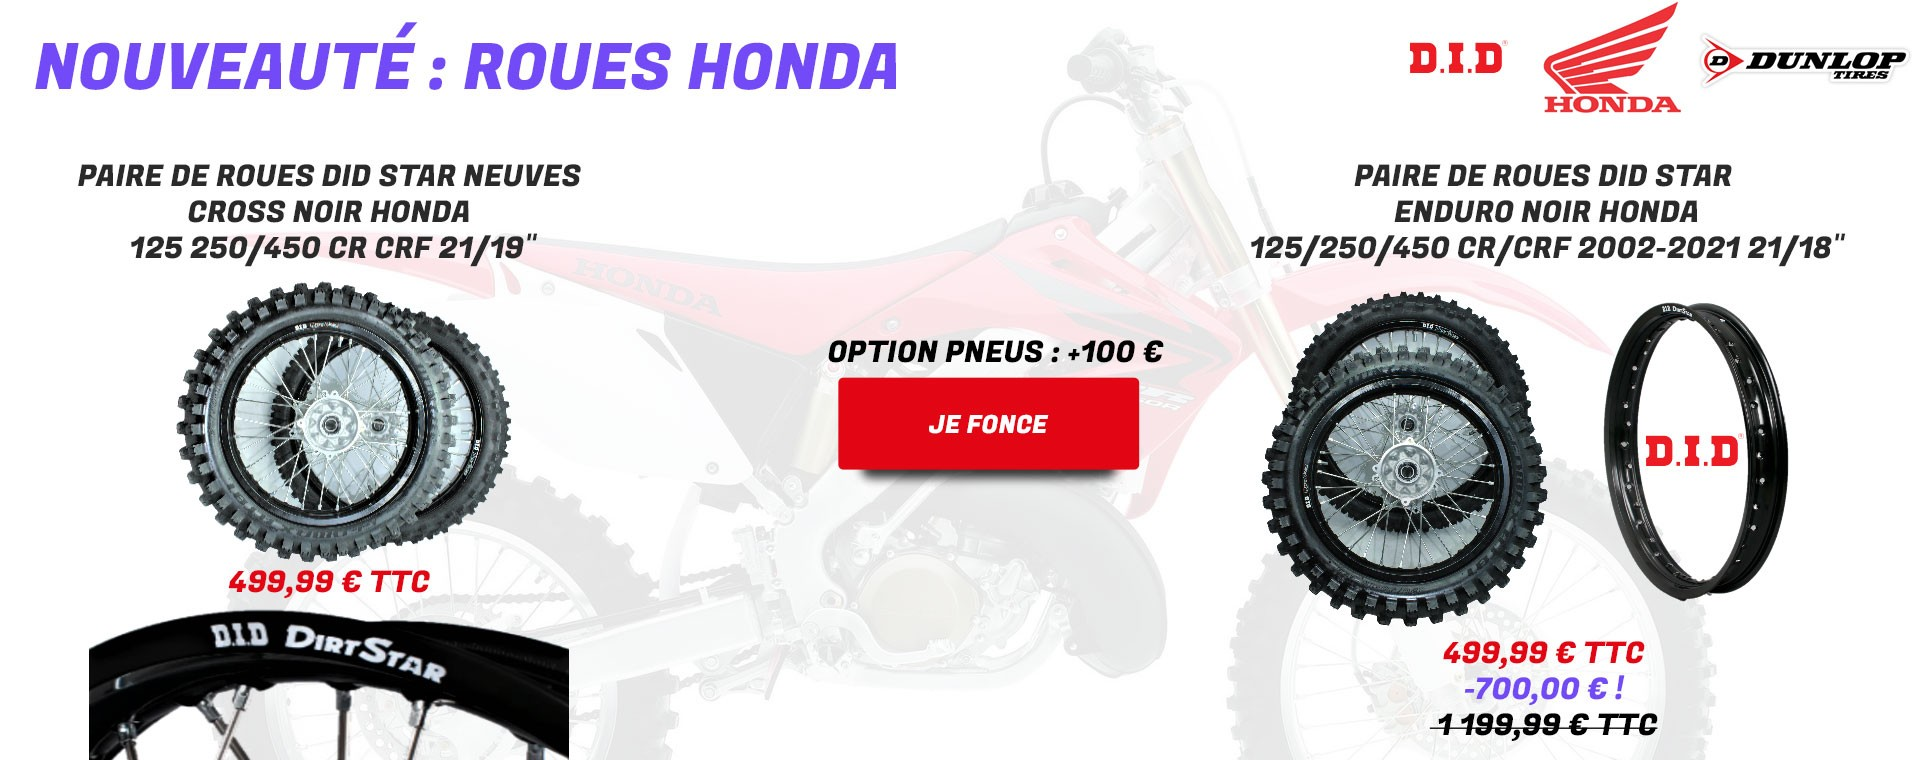 Roues Honda